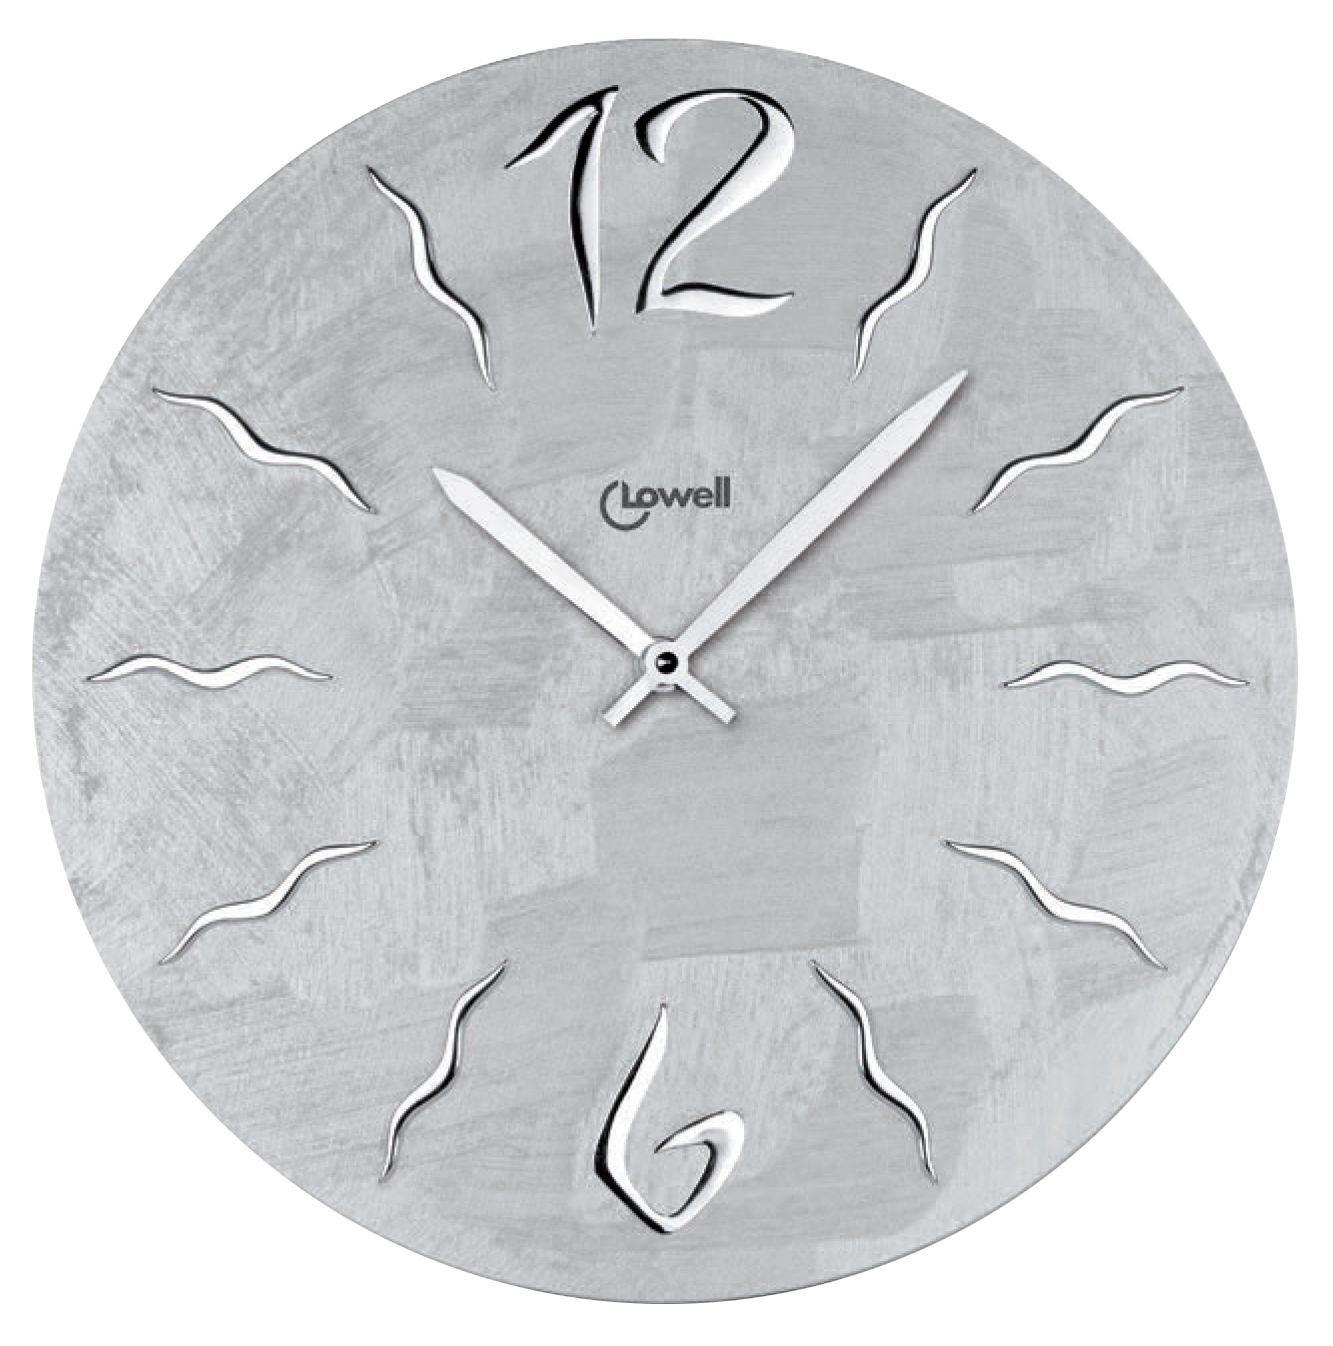 Часы настенные Часы настенные Lowell 11463 chasy-nastennye-lowell-11463-italiya.jpg